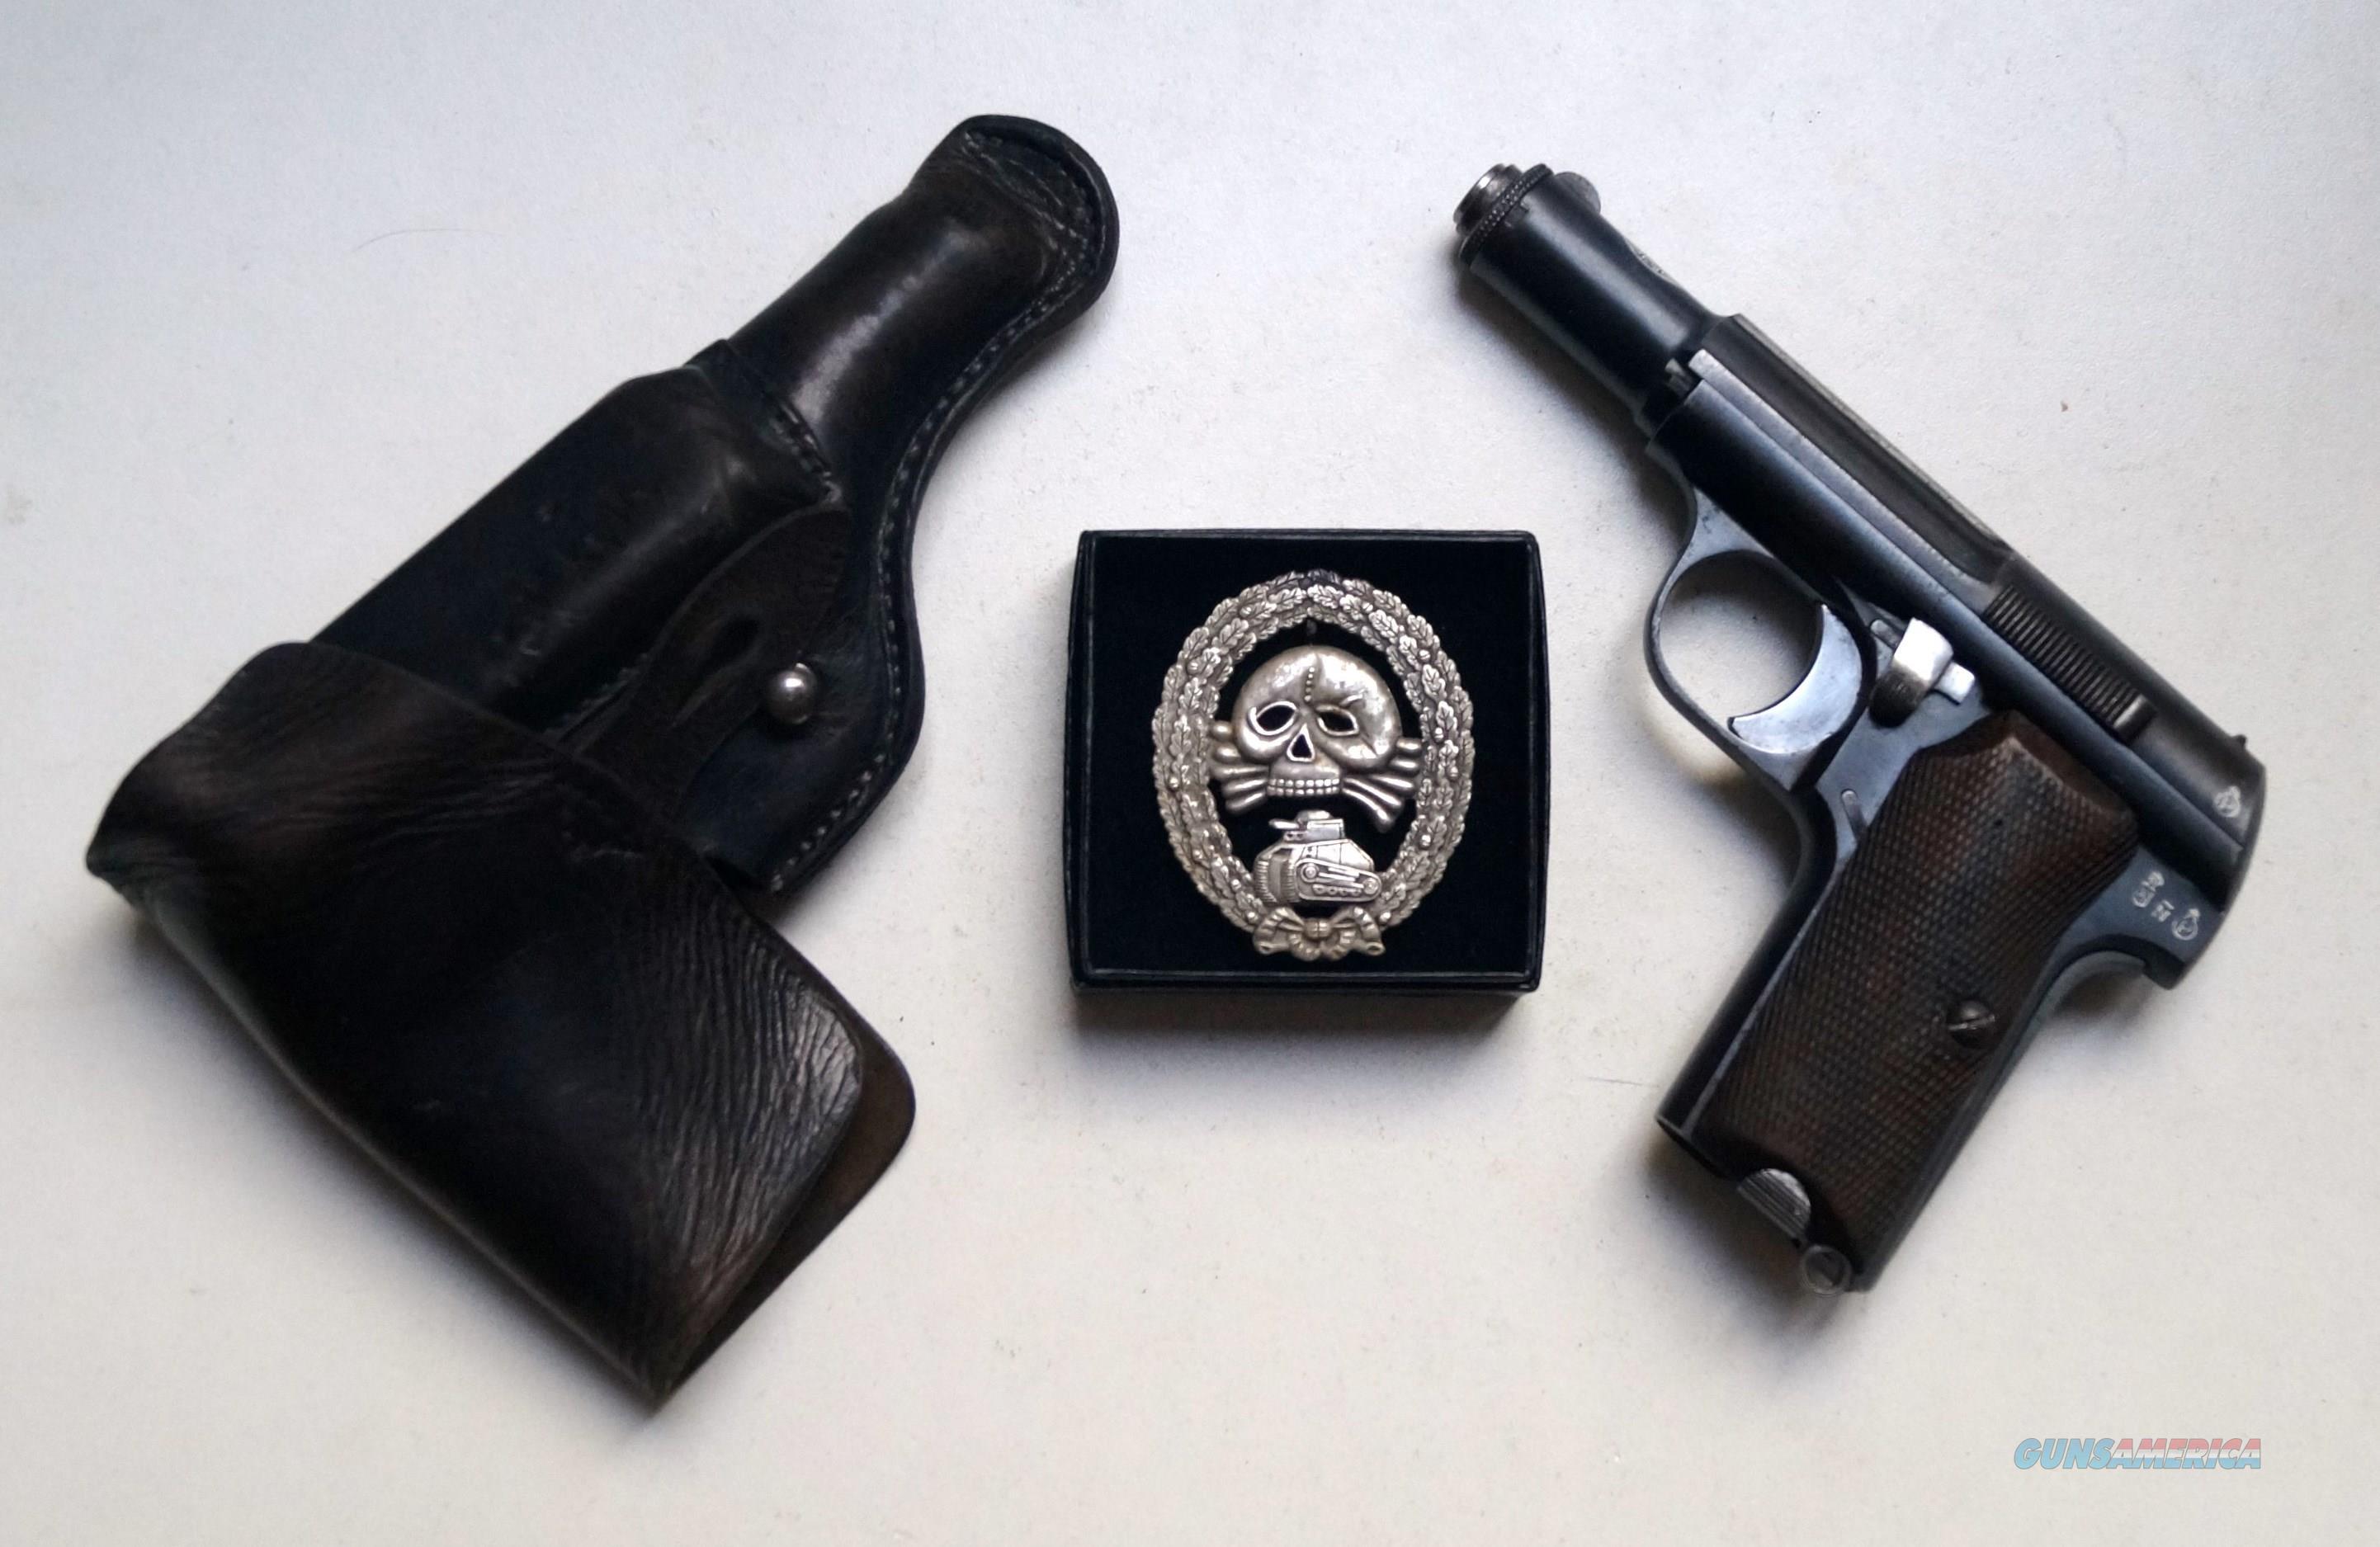 ASTRA 300 NAZI MARKED RIG WITH SPANISH CONDOR  BADGE  Guns > Pistols > Astra Pistols